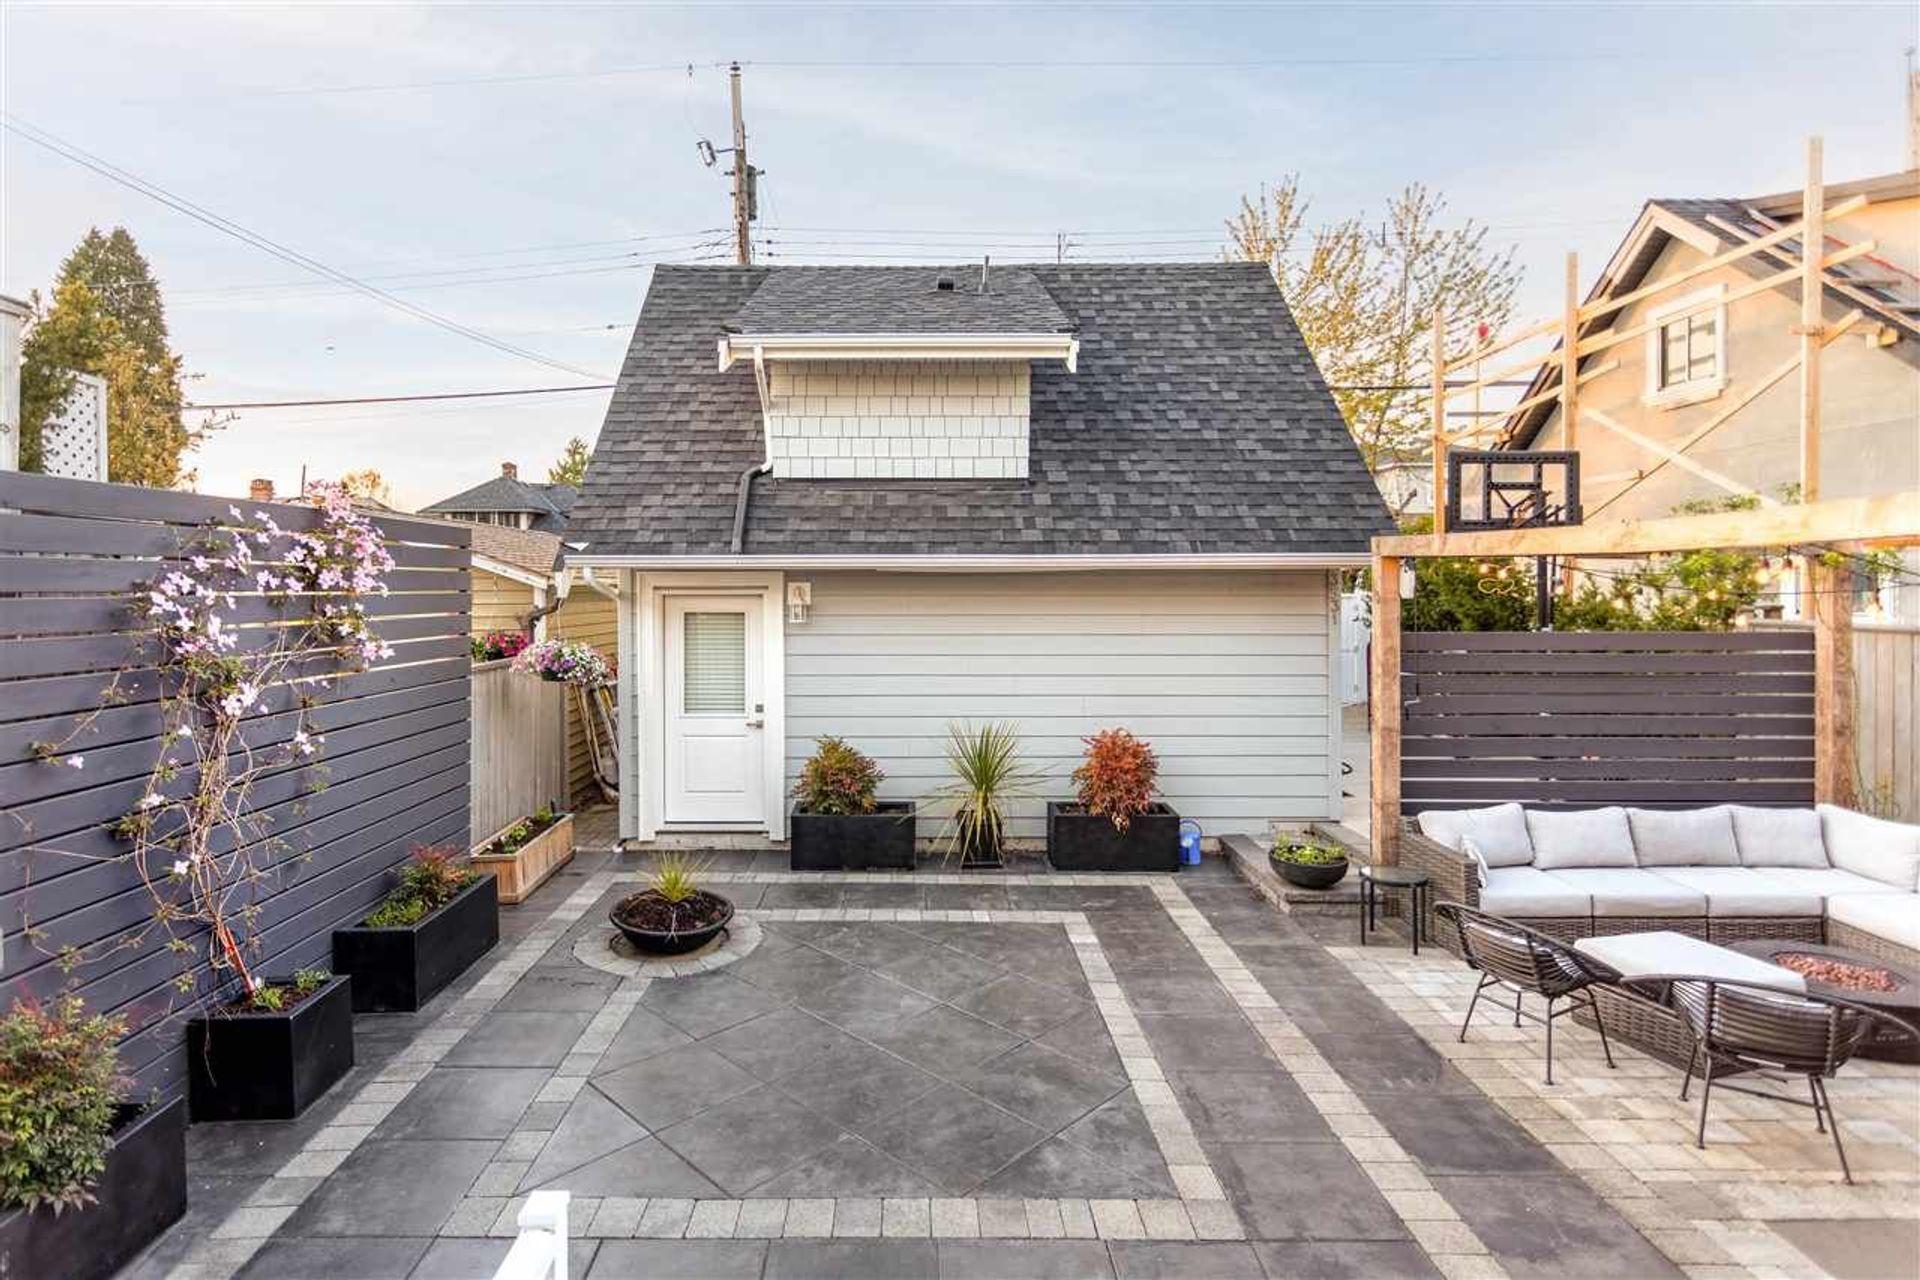 3535-dundas-street-hastings-sunrise-vancouver-east-26 at 3535 Dundas Street, Hastings Sunrise, Vancouver East